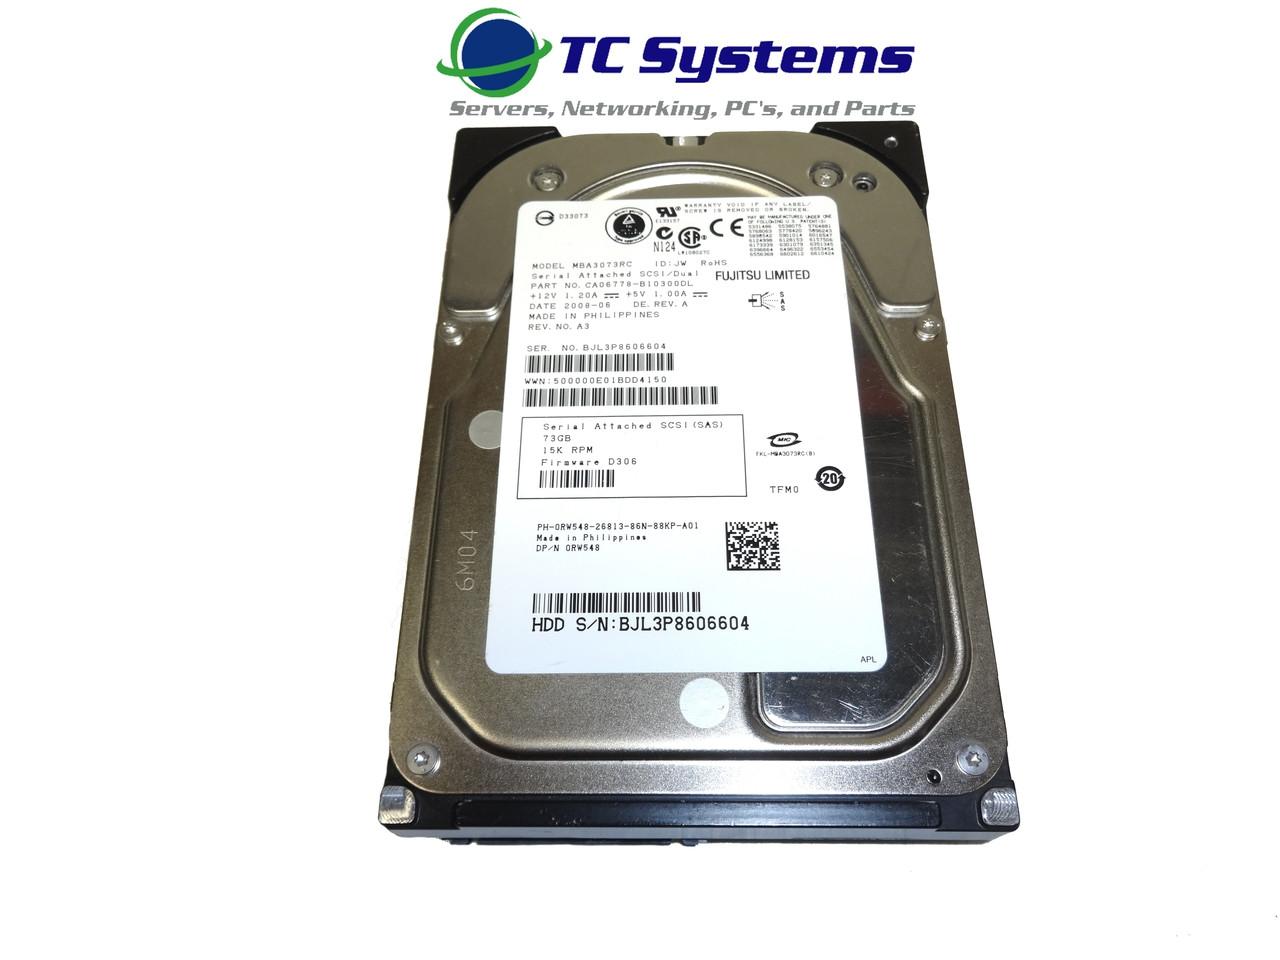 Dell RW548 MBA3073RC 73GB SAS 15k 3.5 Hard Drive